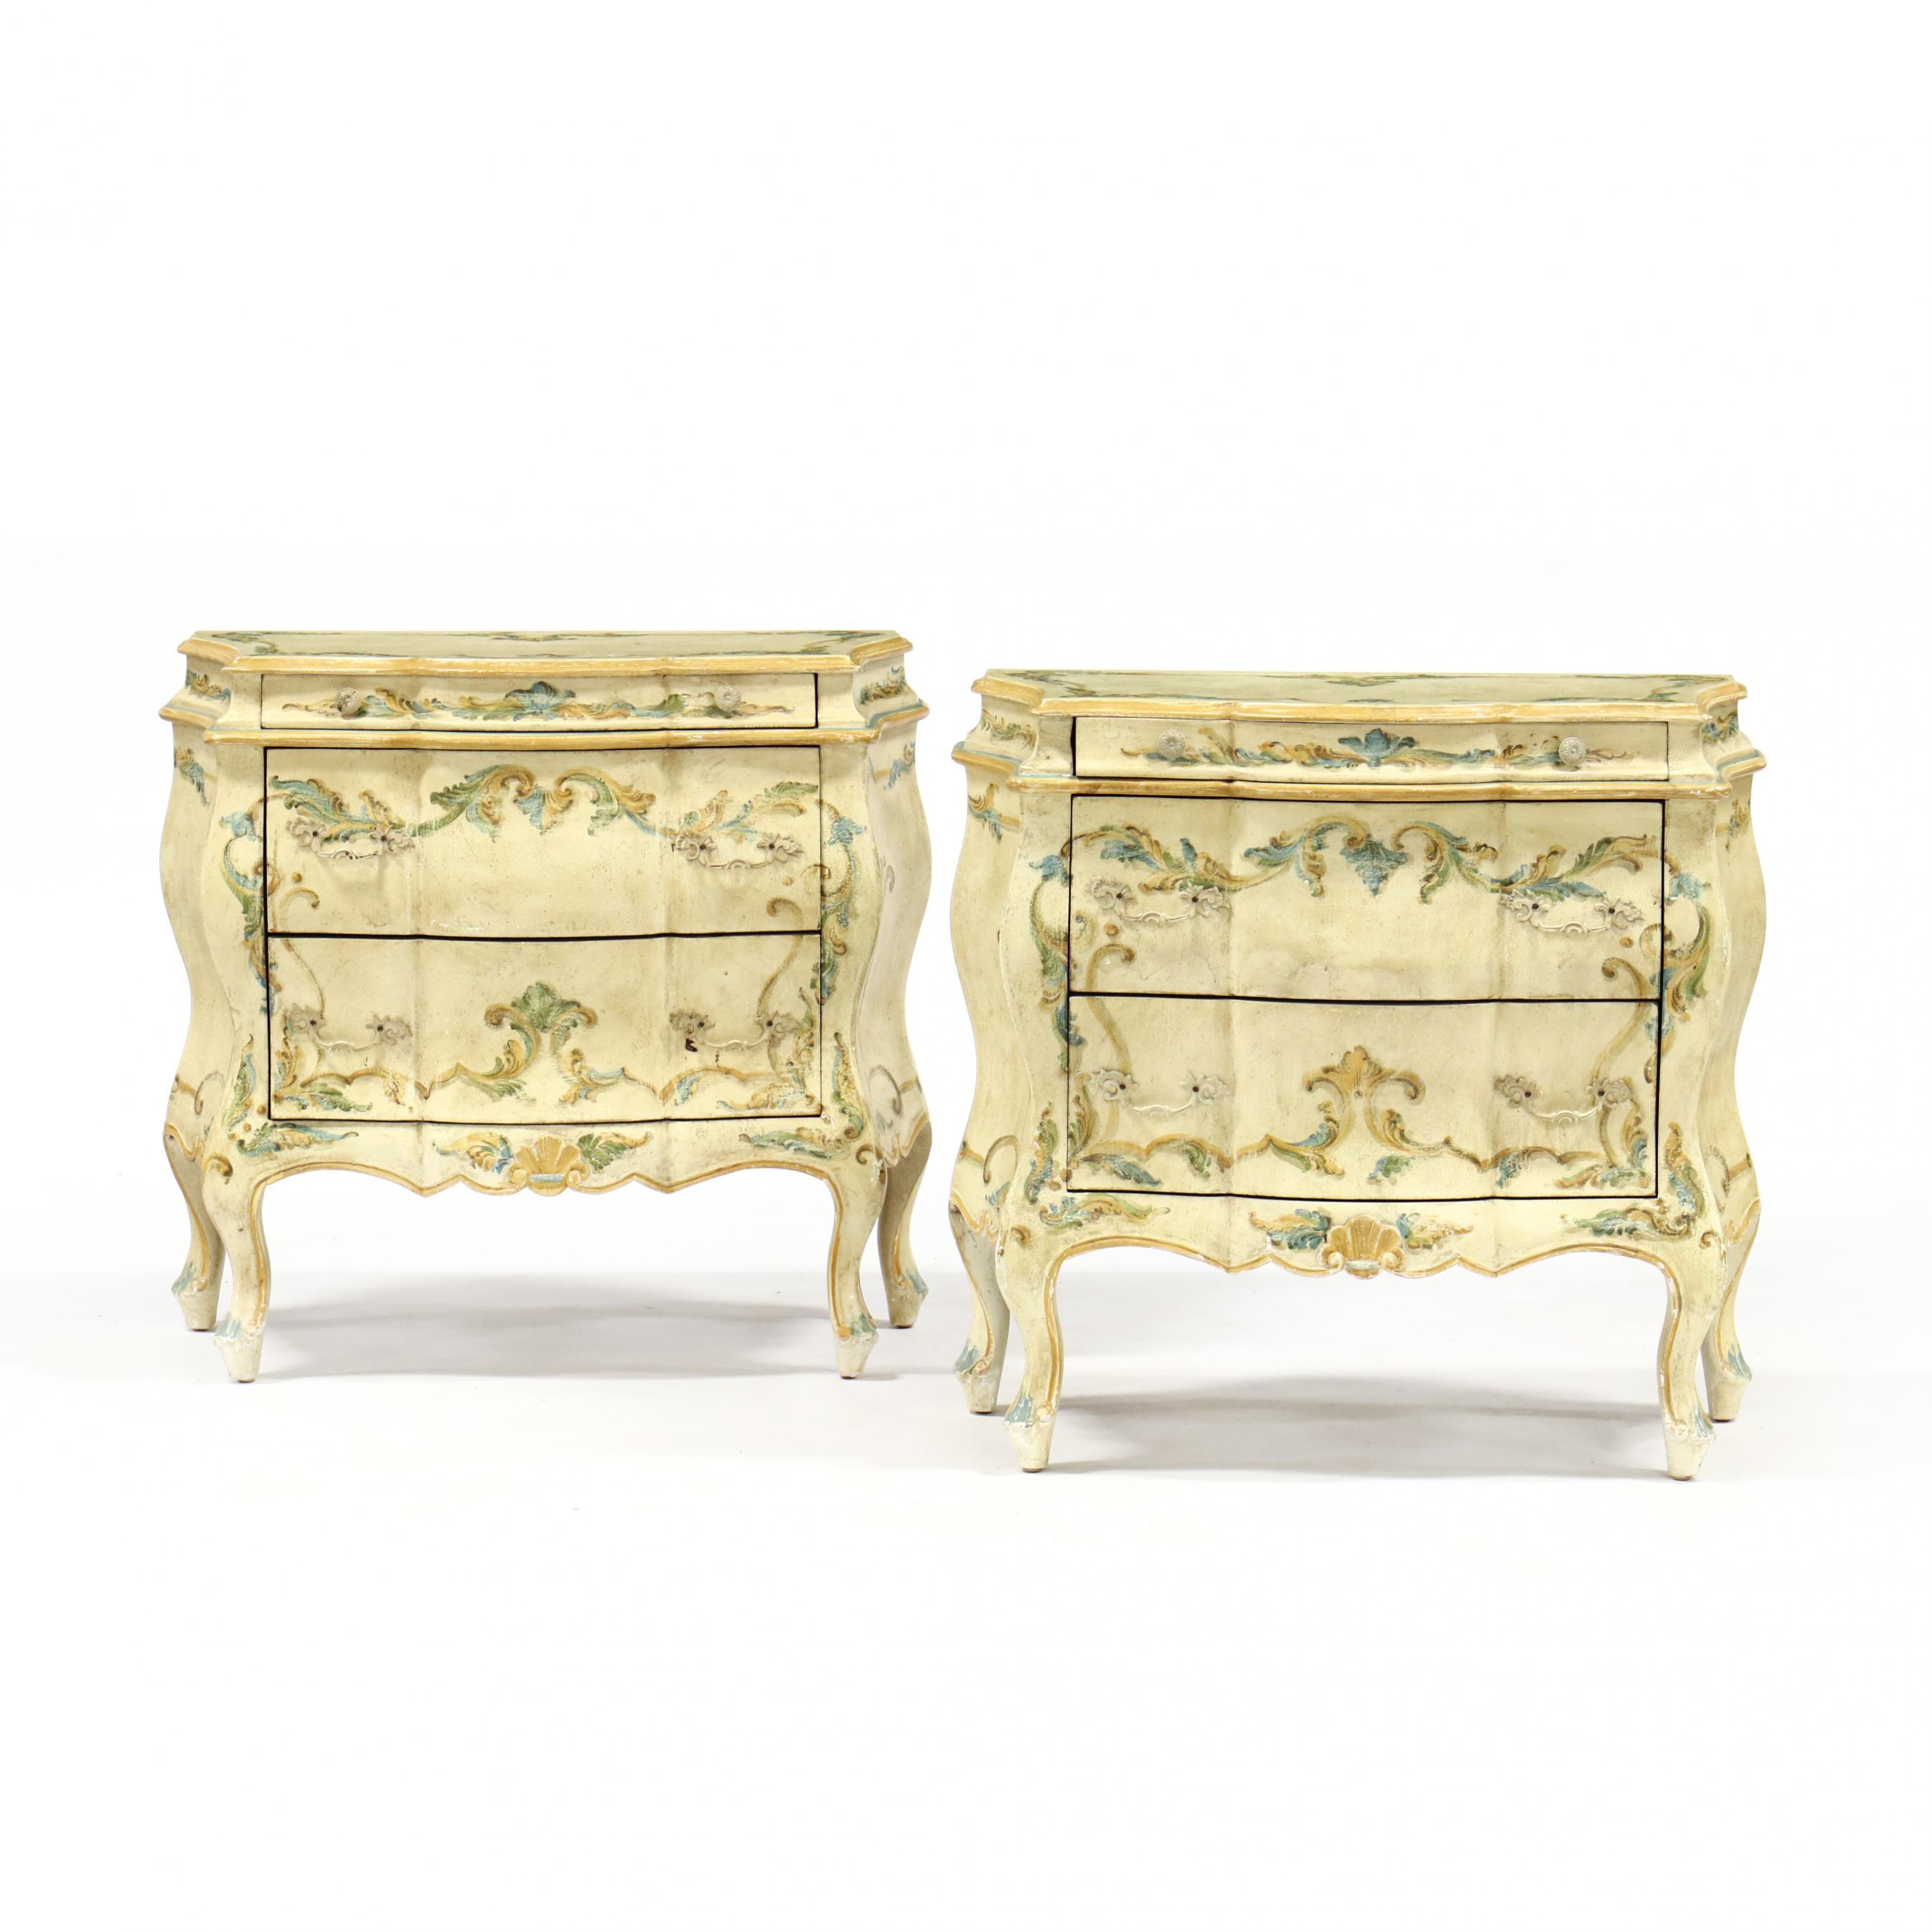 pair-of-diminutive-italian-bombe-painted-chests